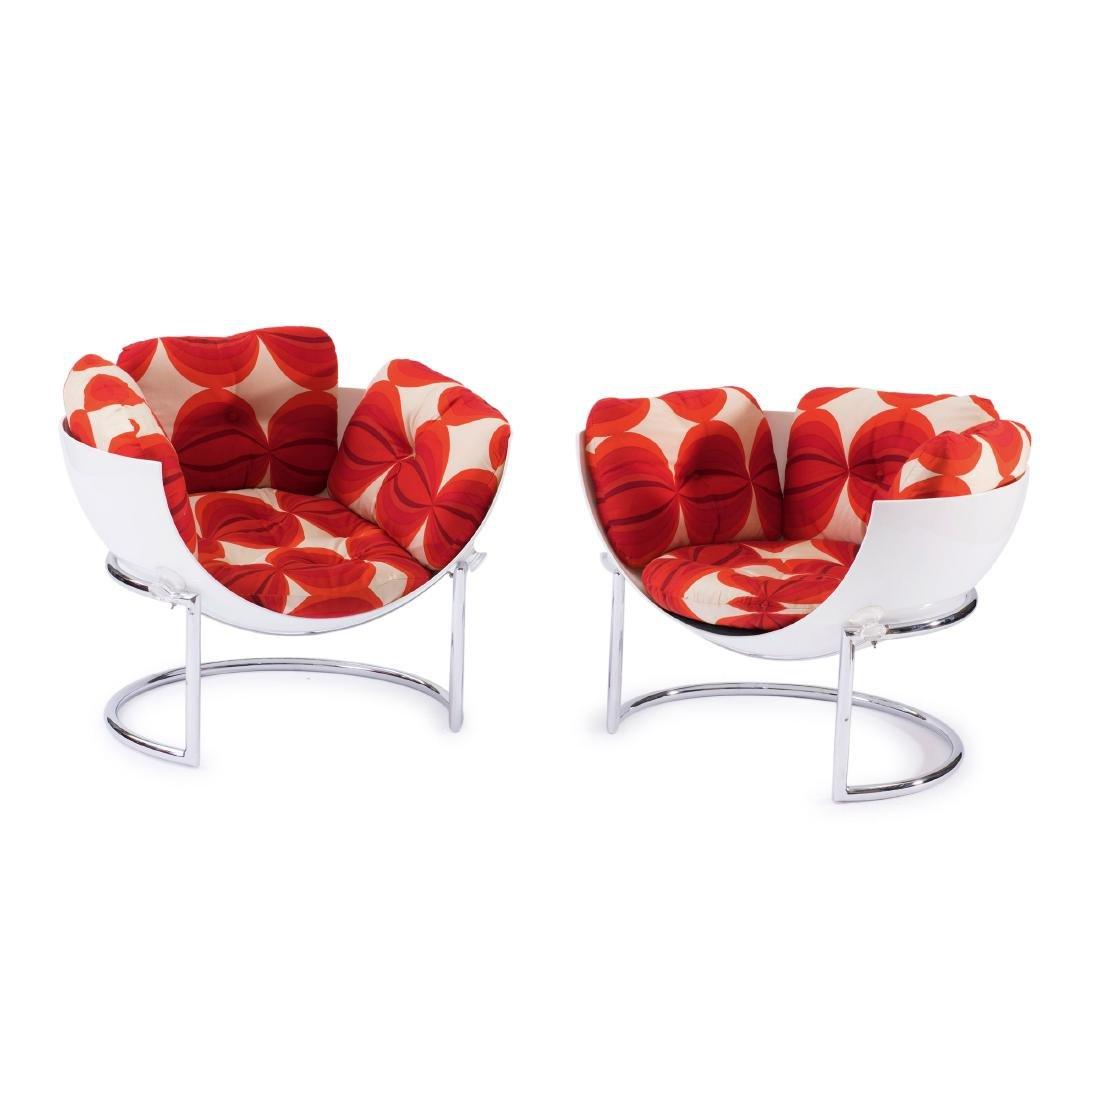 Two 'Joker' easy chairs, c. 1966